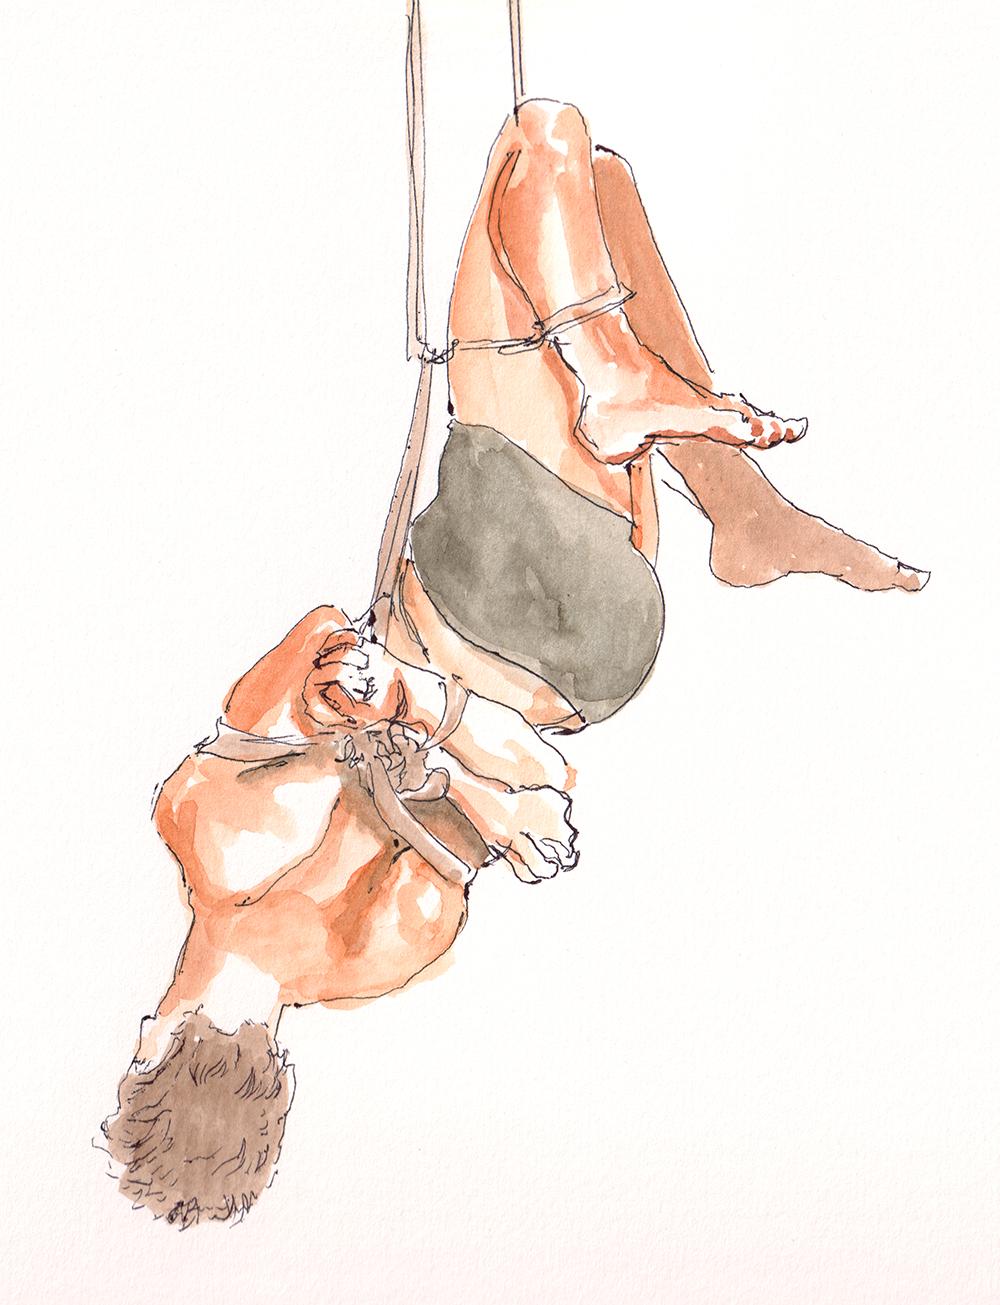 BudoucíThe Other Side of Ropes